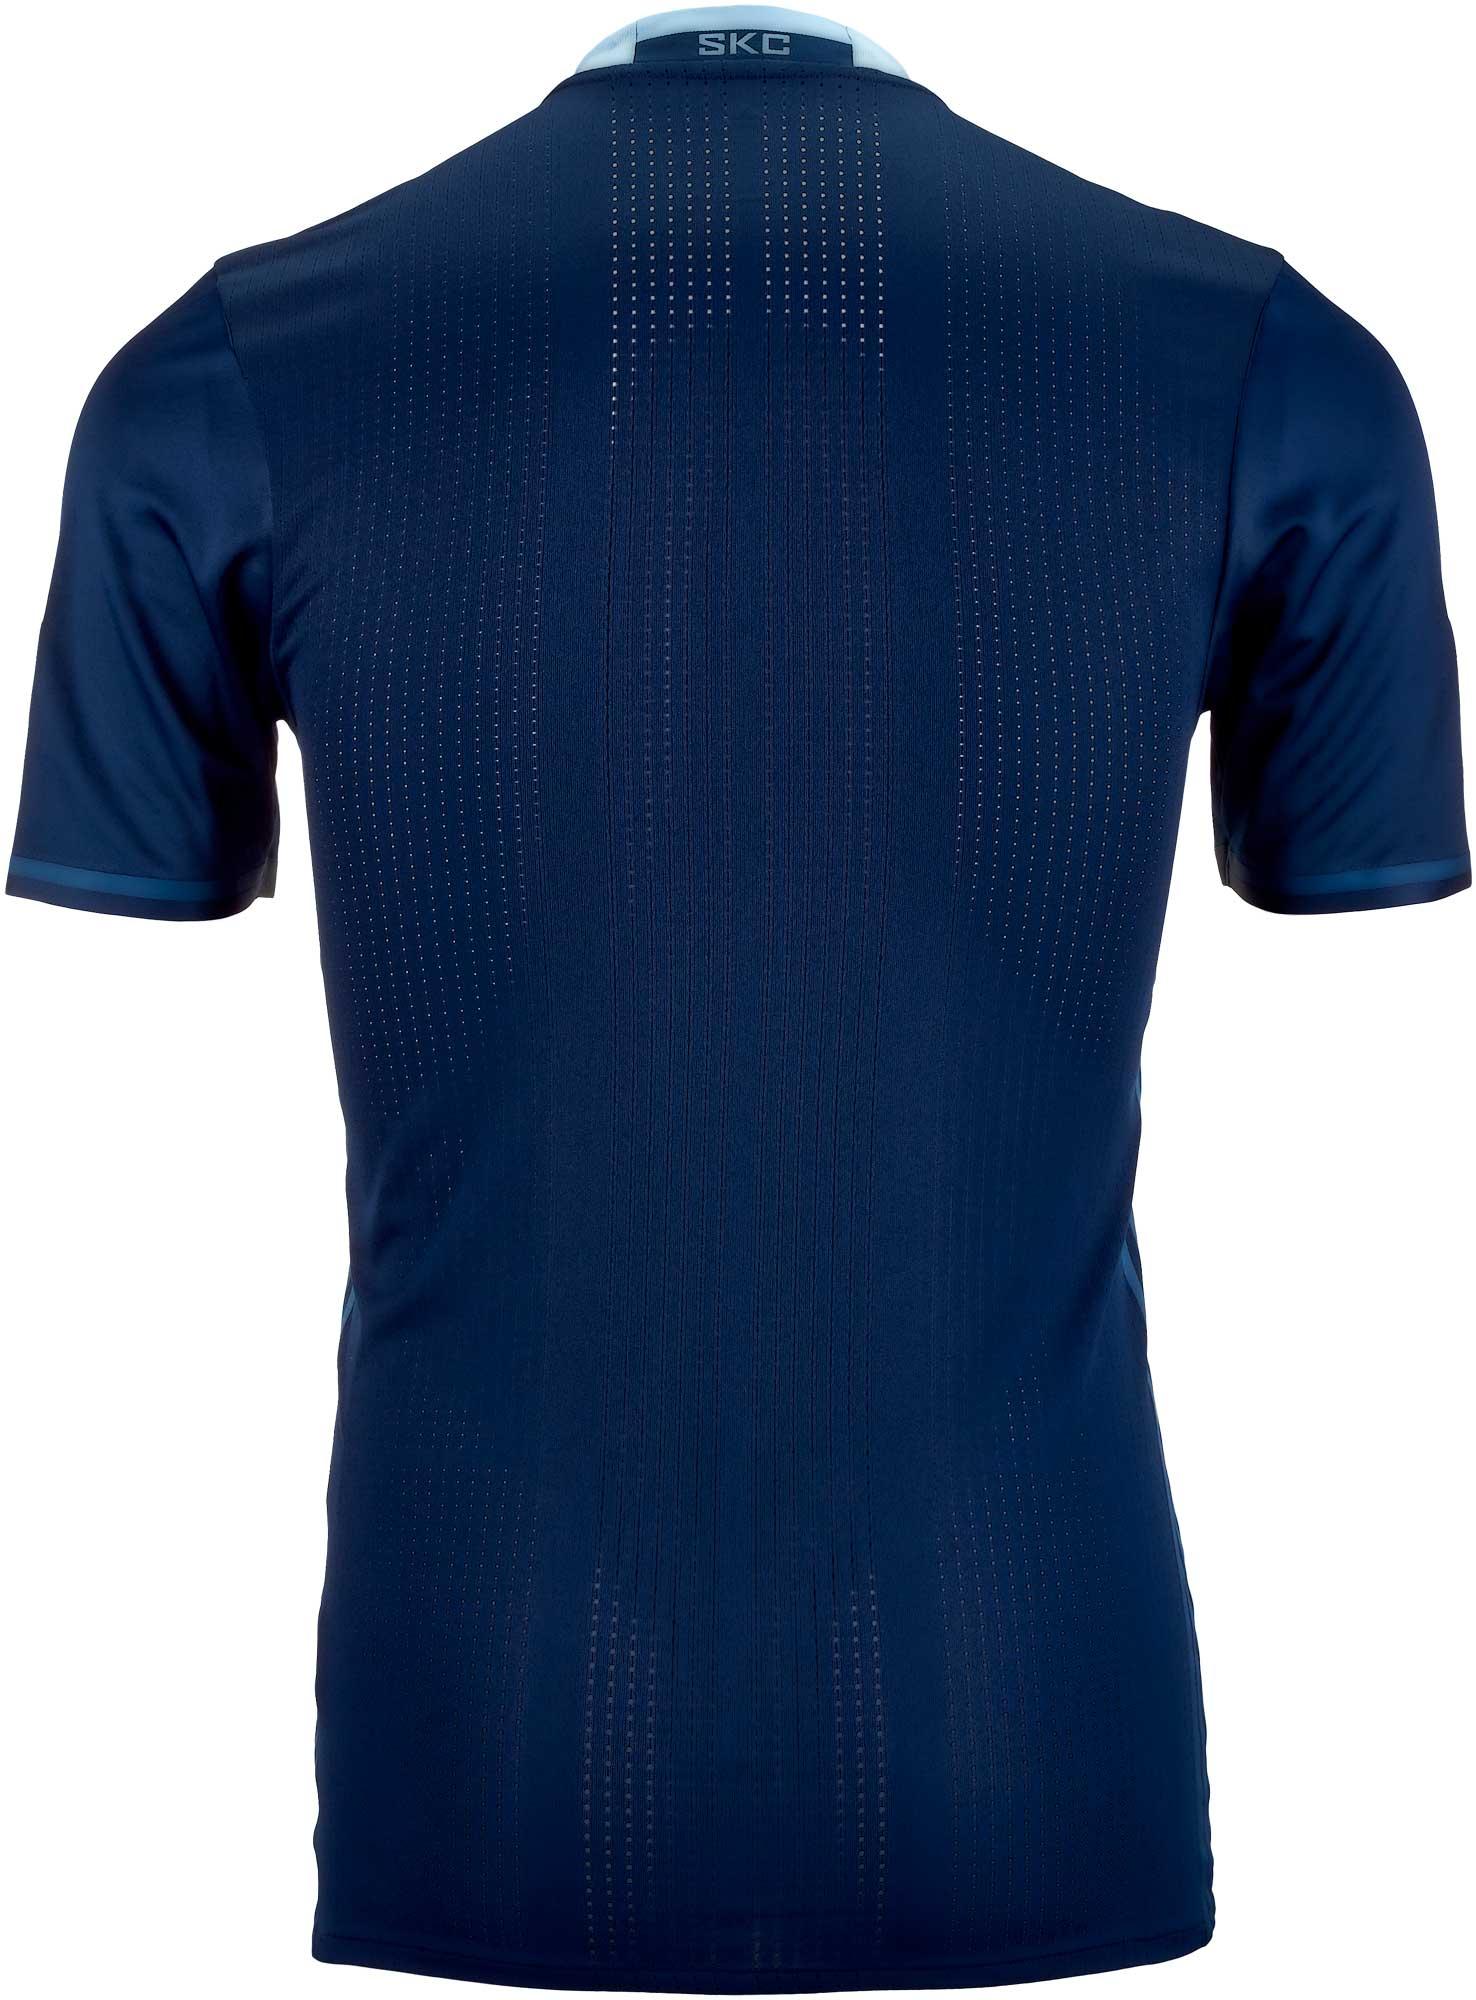 buy online ee456 75fa7 adidas Sporting Kansas City Away Jersey - 2016 Sporting KC Jerseys